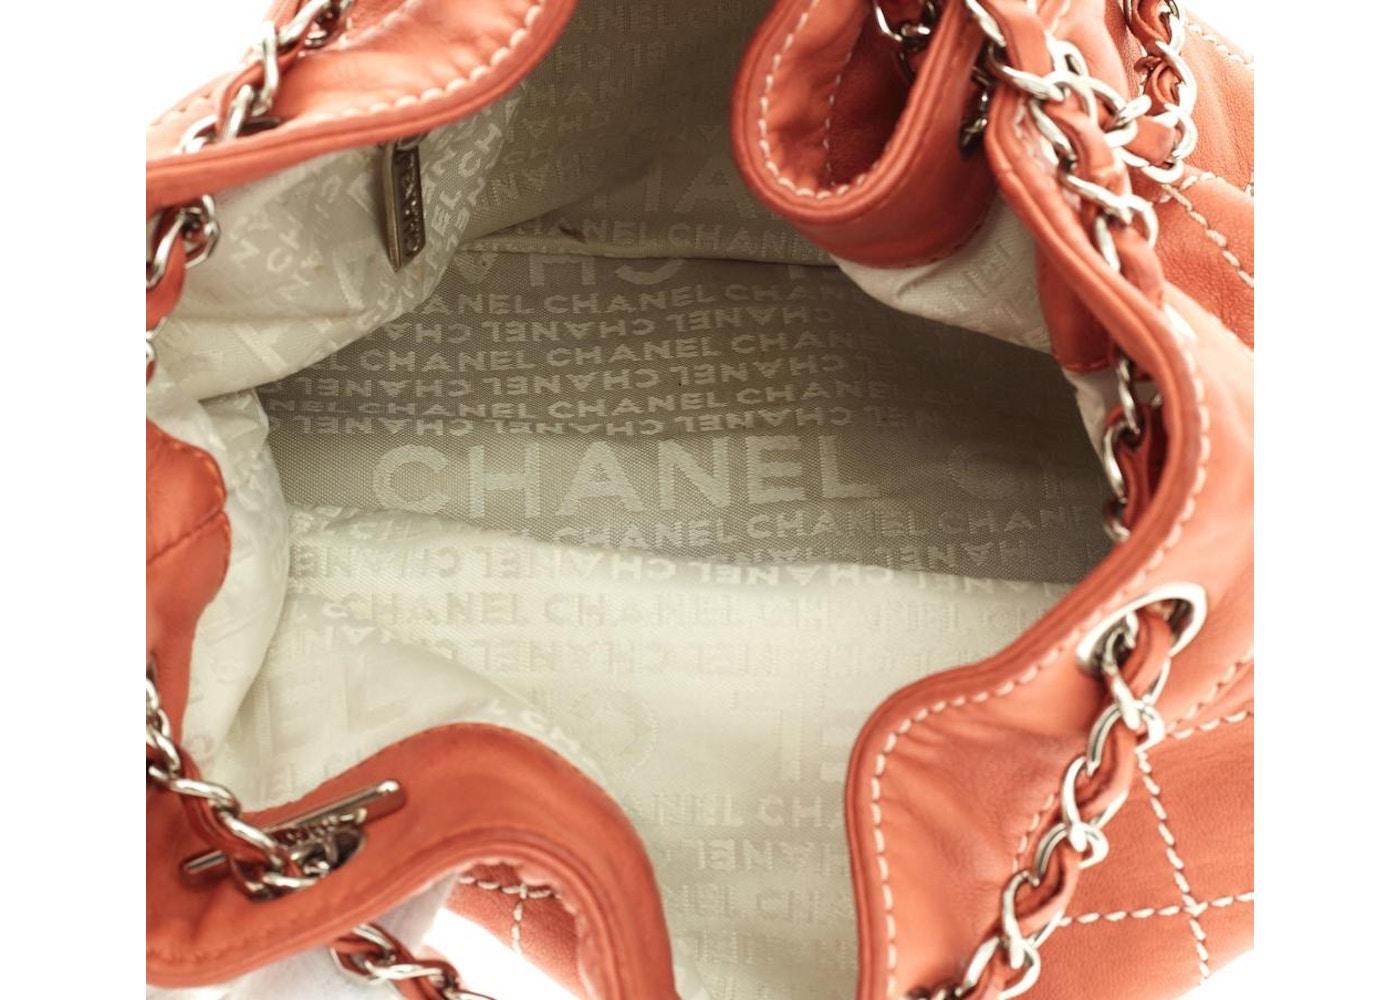 f10c51380fbd Chanel Surpique Stitch Drawstring Bucket Quilted Diamond Salmon Pink